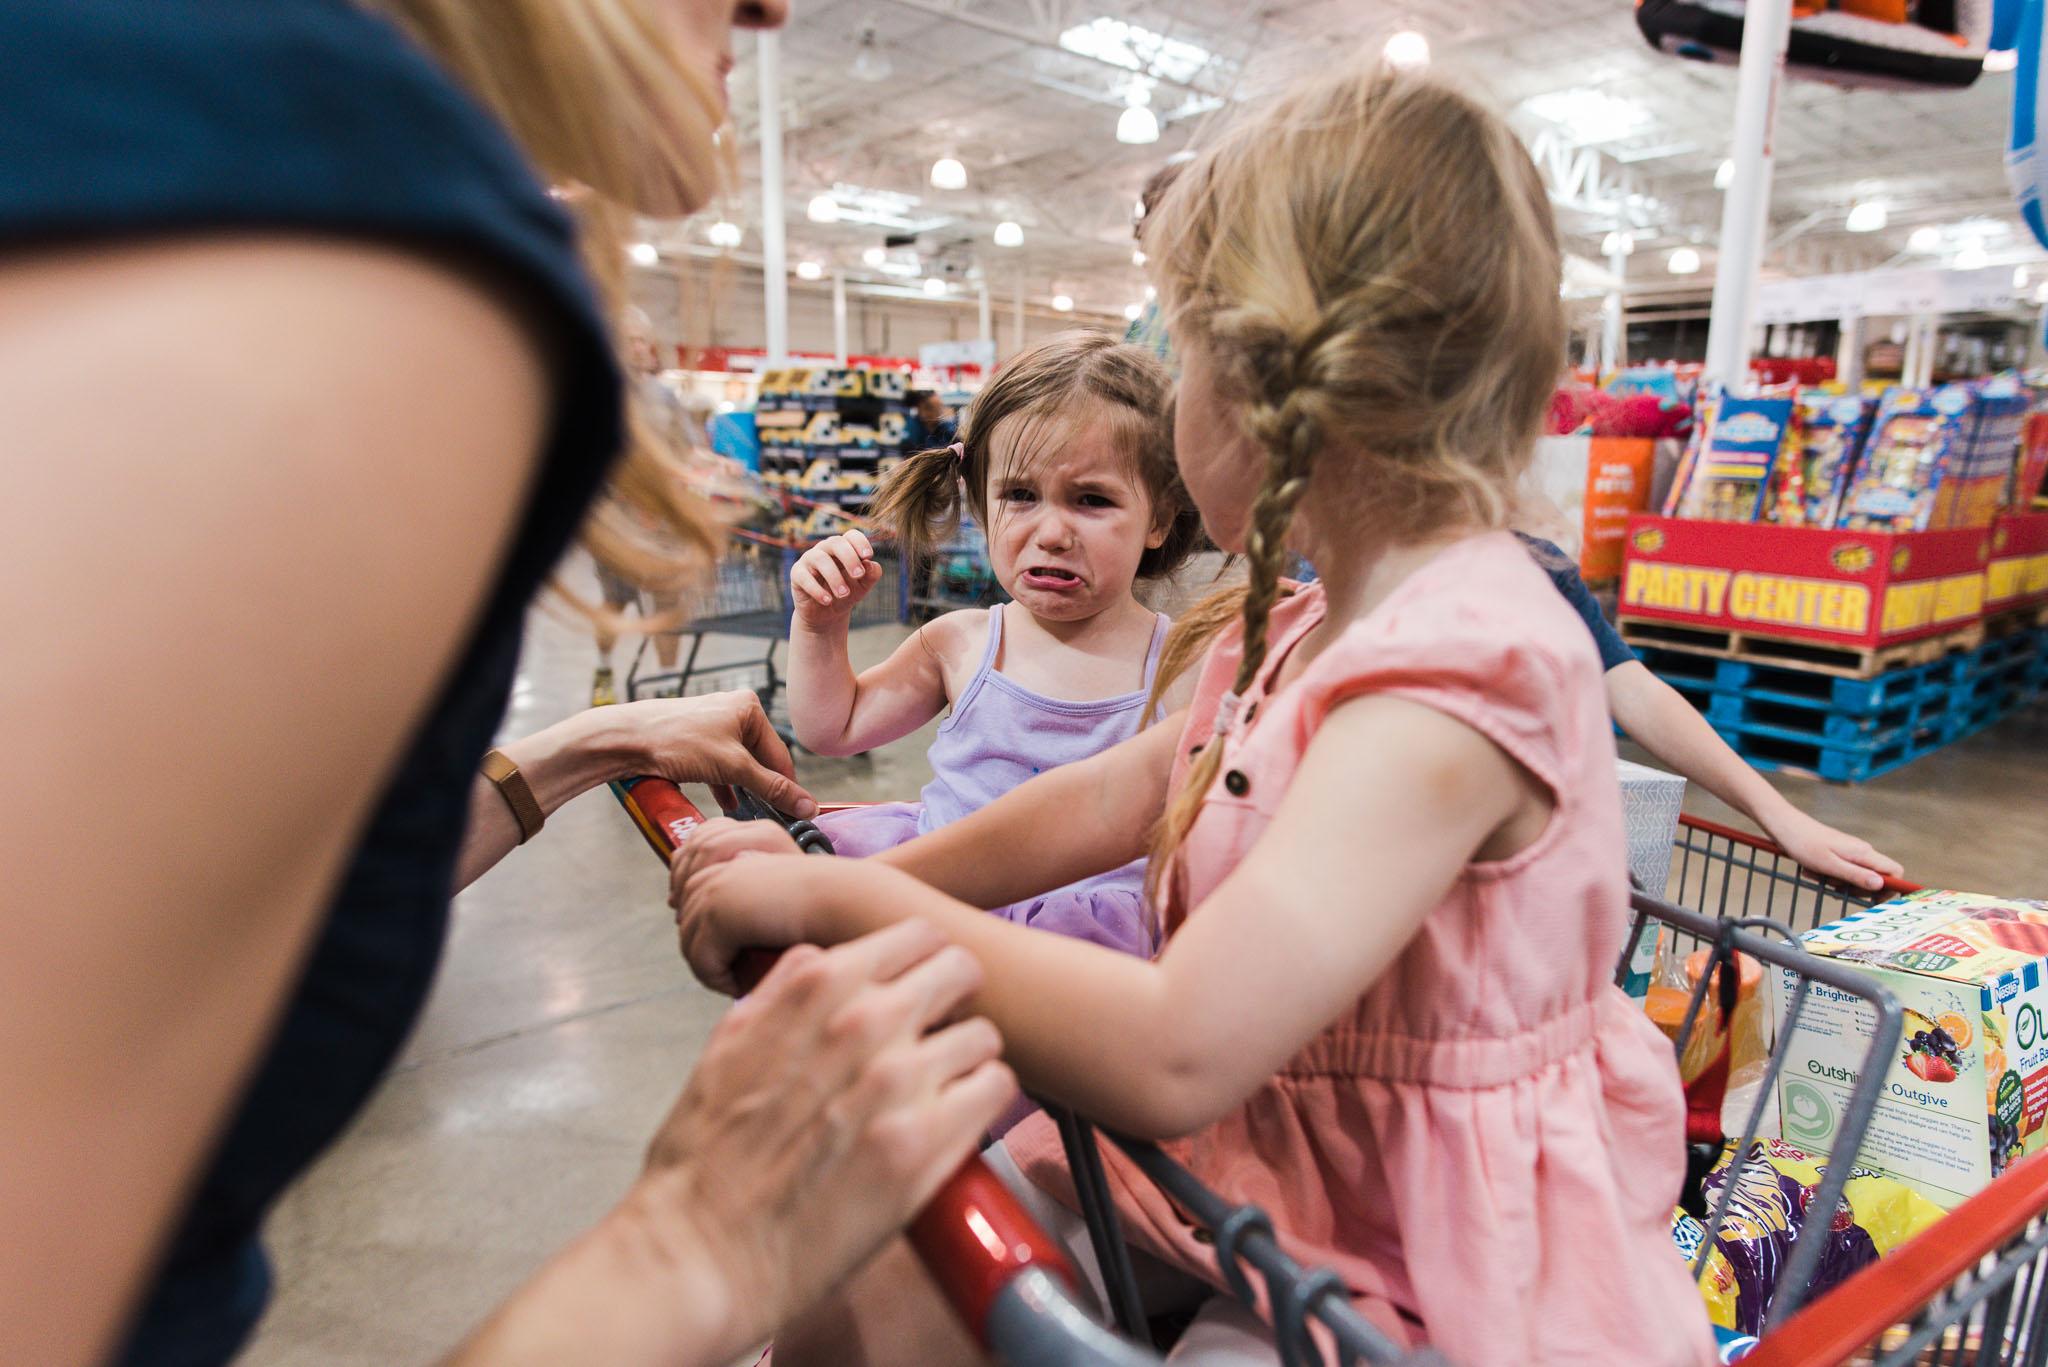 Costco-mom-five-children-blog-6.jpg